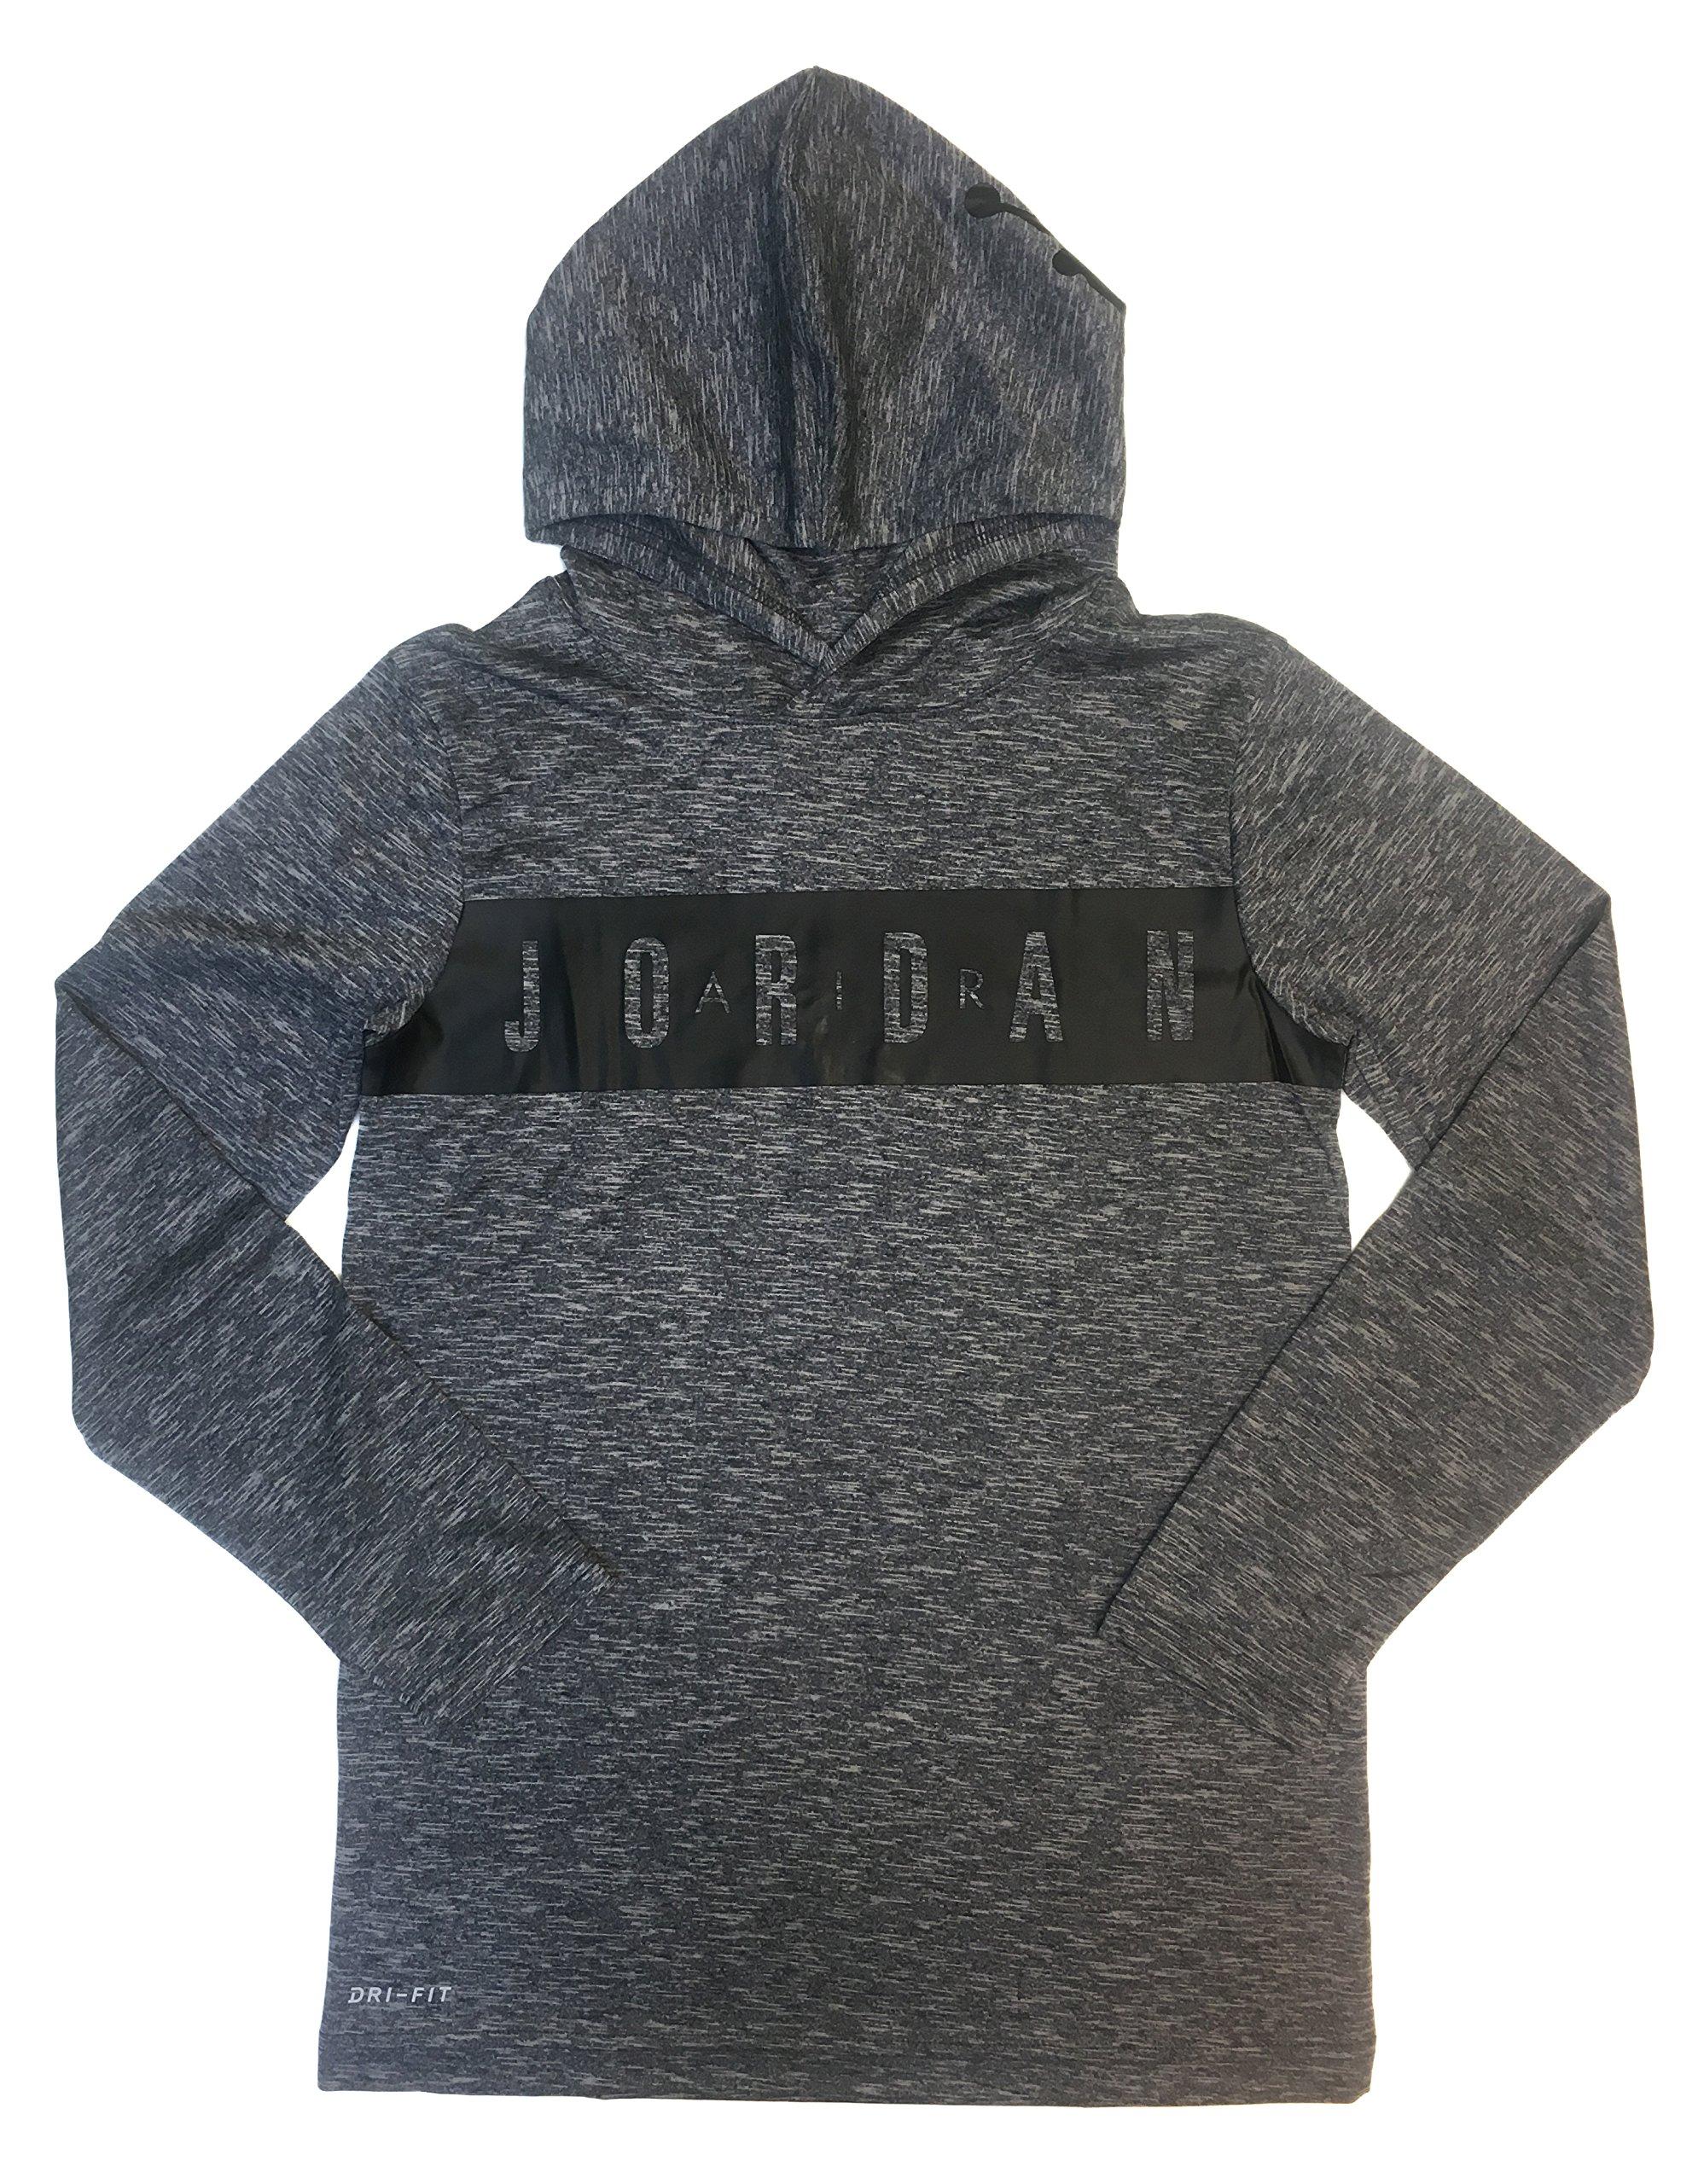 NIKE Air Jordan Boy's Lightweight Dri-Fit Breathe Hoodie (Large, Light Smoke Grey)